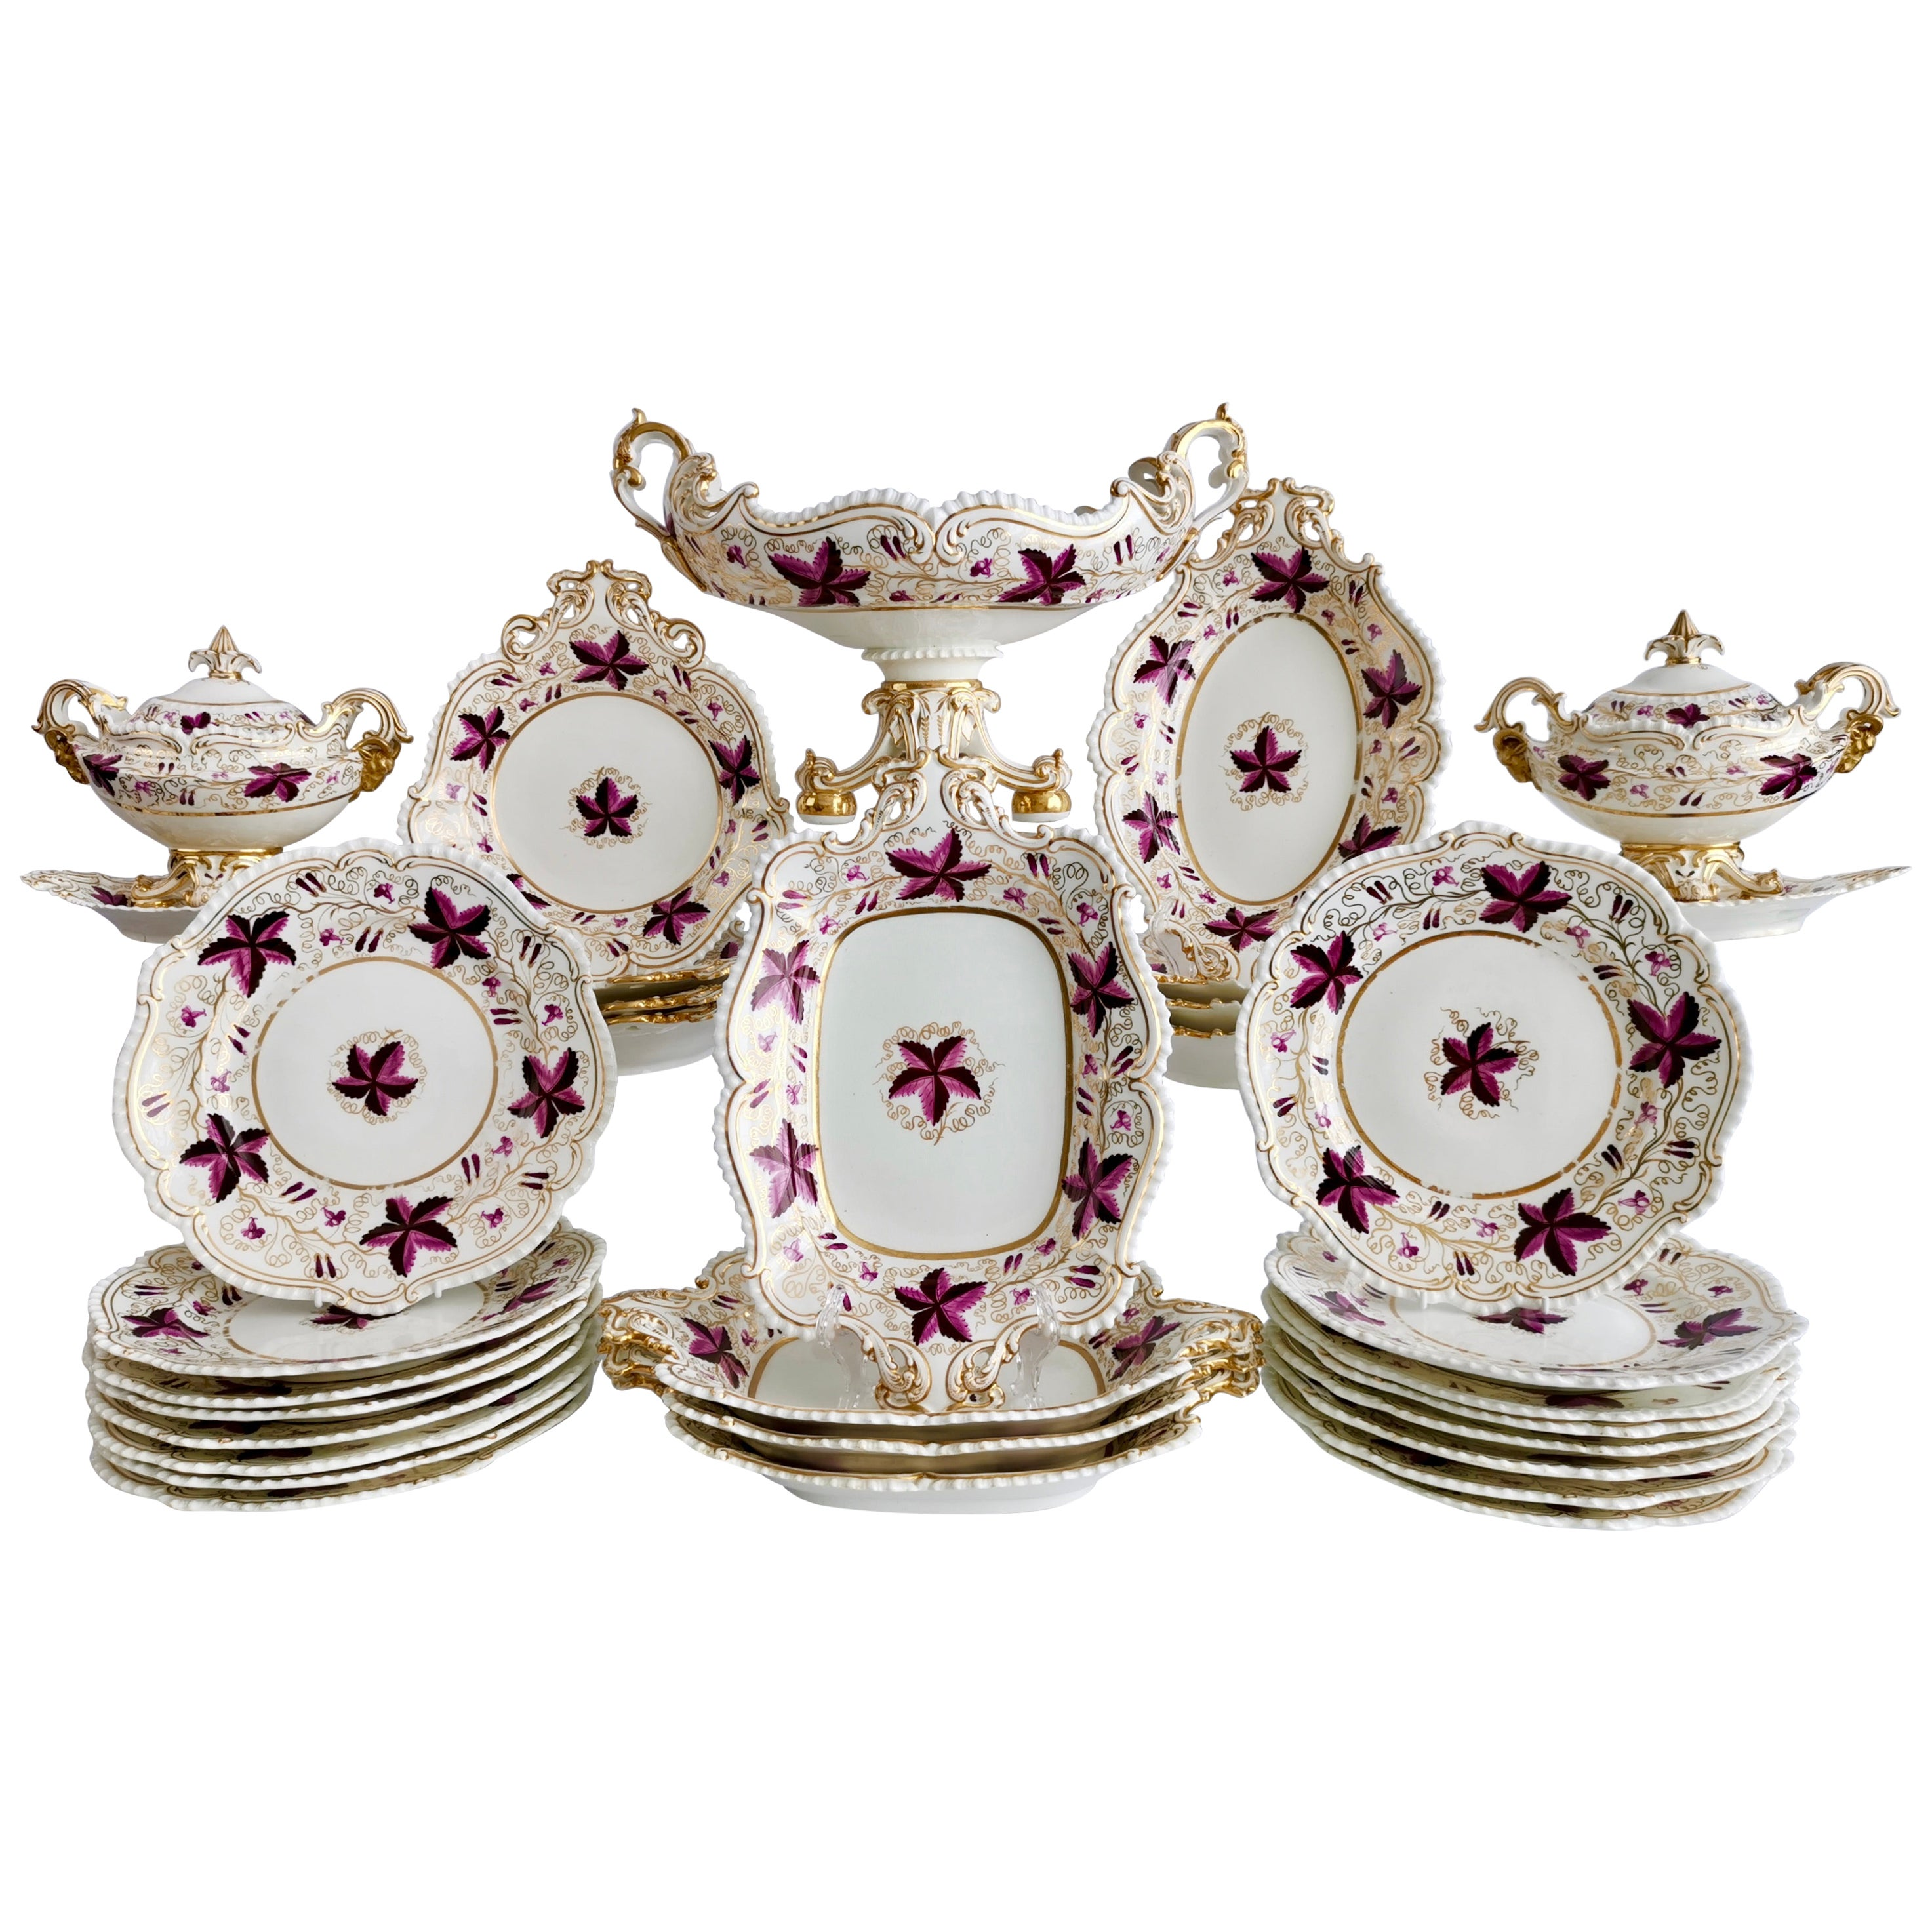 Coalport Porcelain Dessert Service, Purple Vines, Rams Heads, Regency, ca 1820